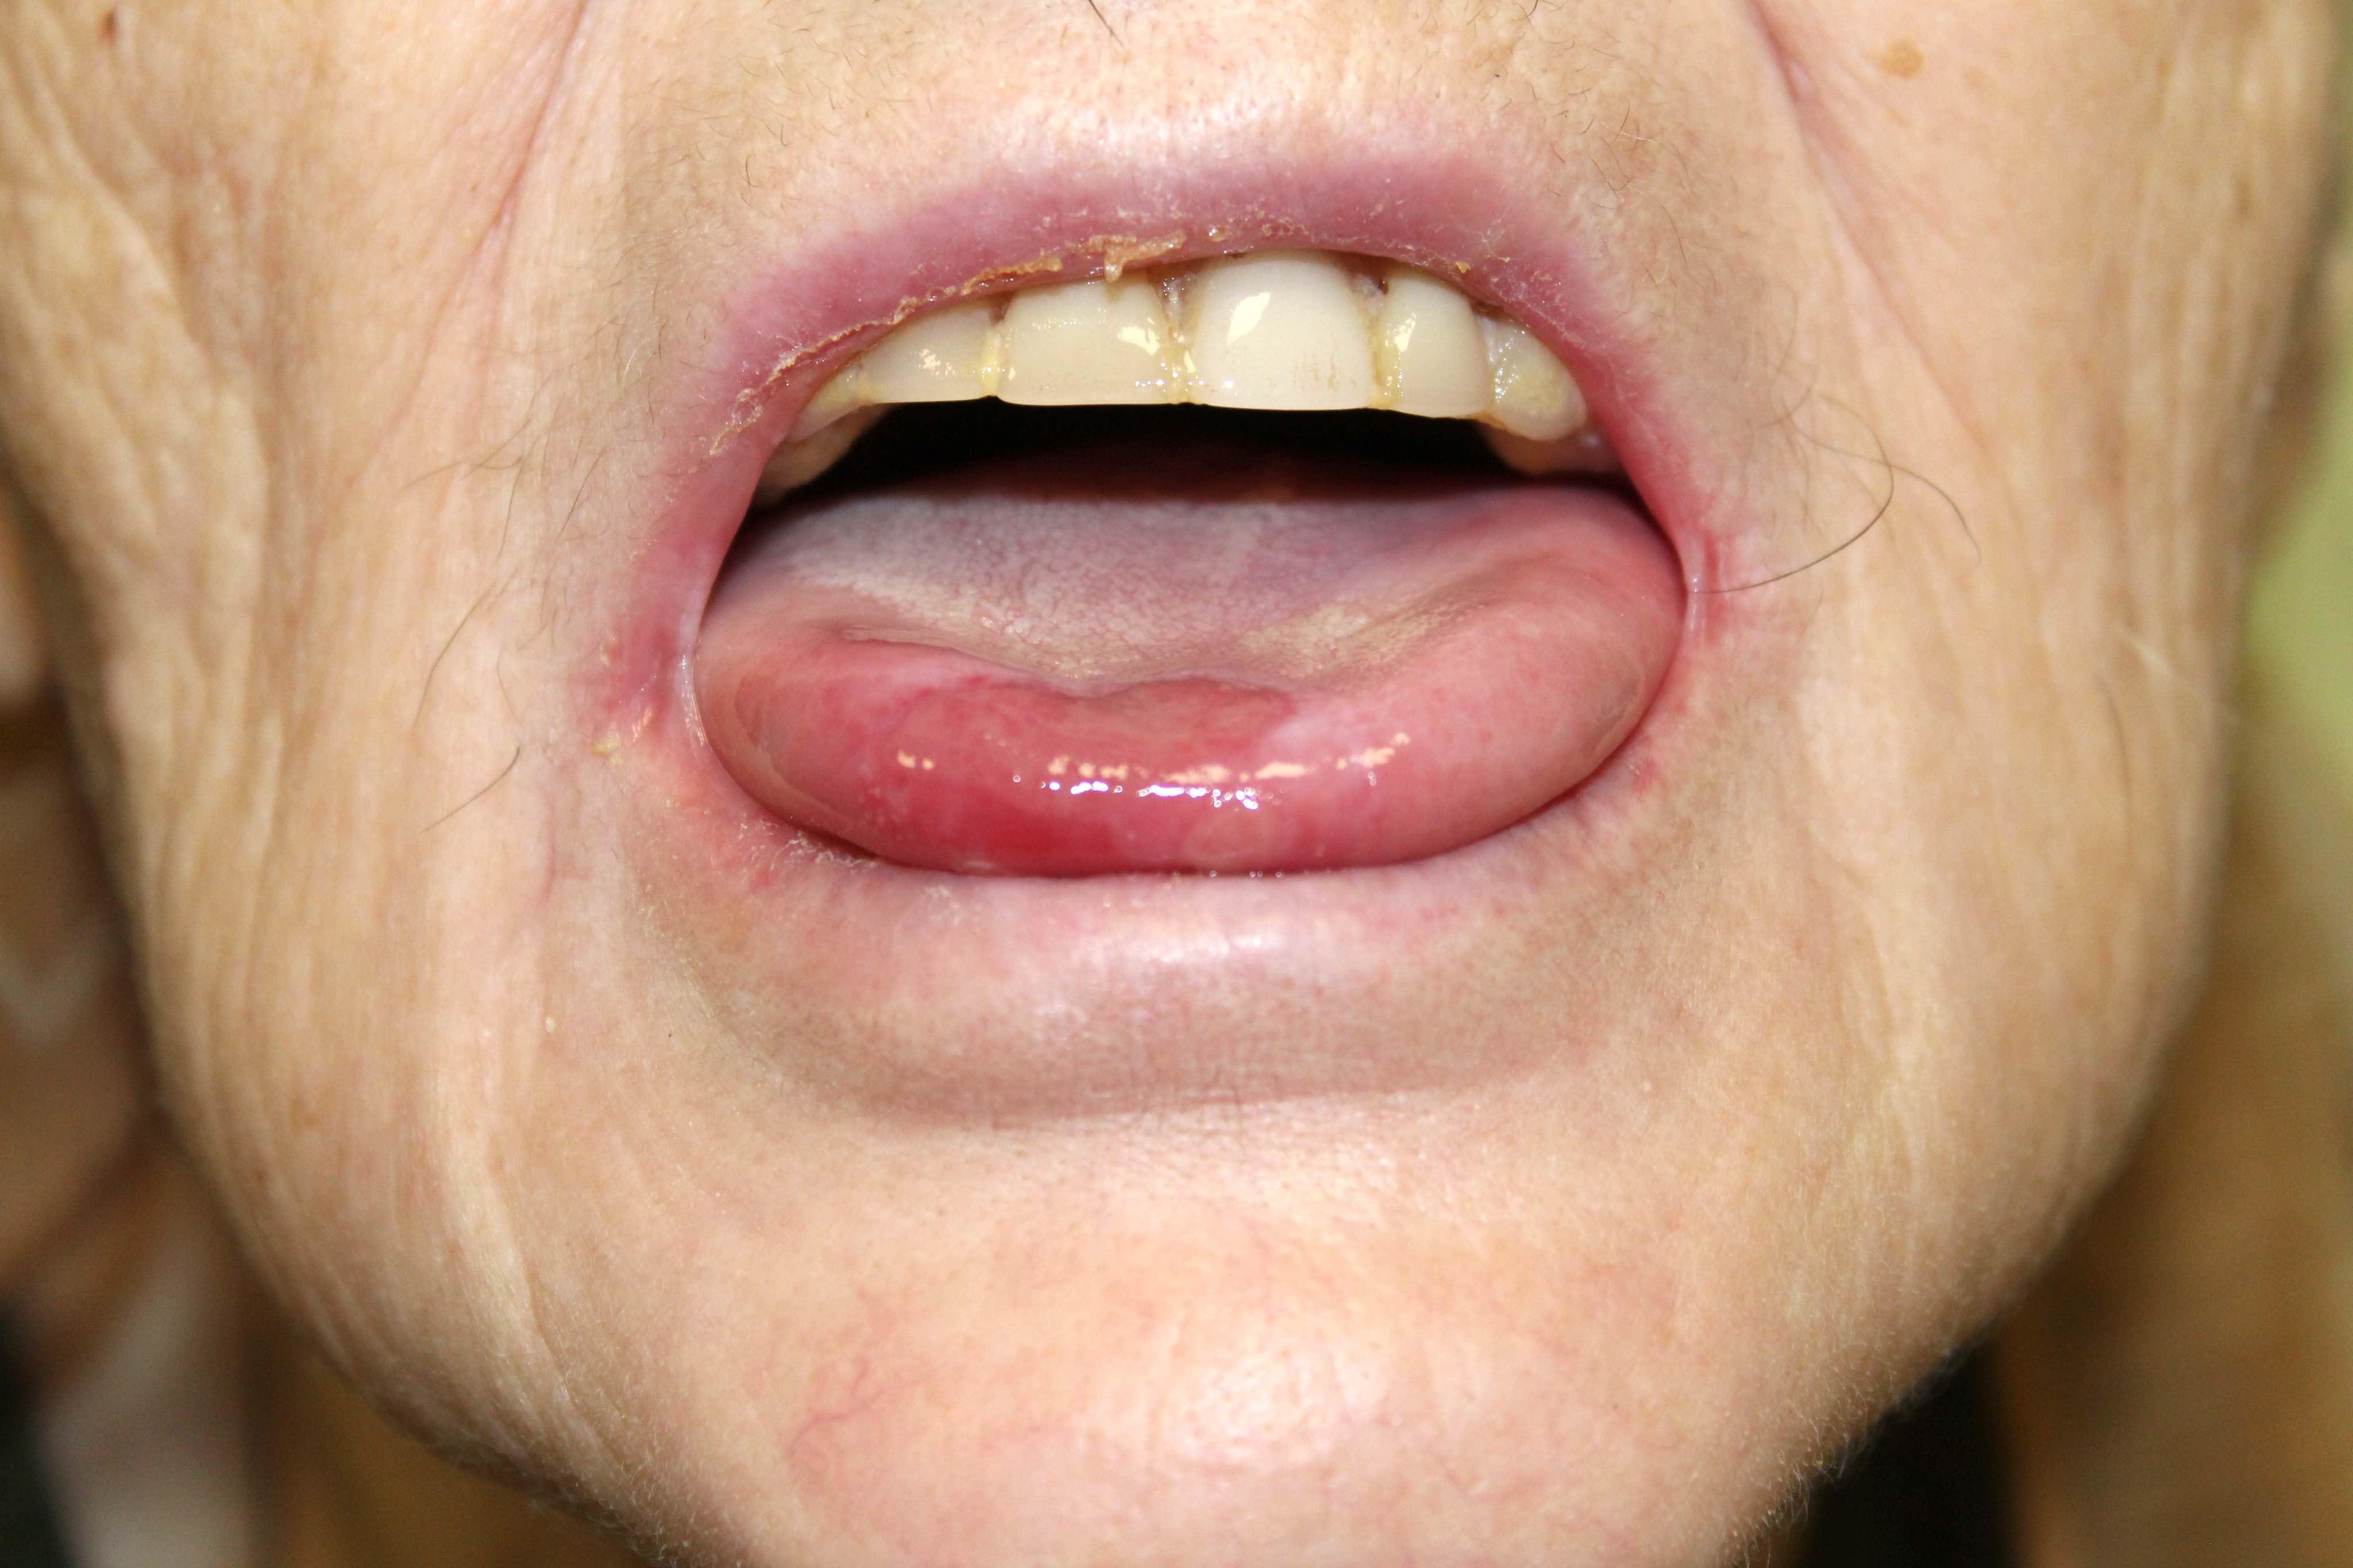 Erosions on oral mucosa